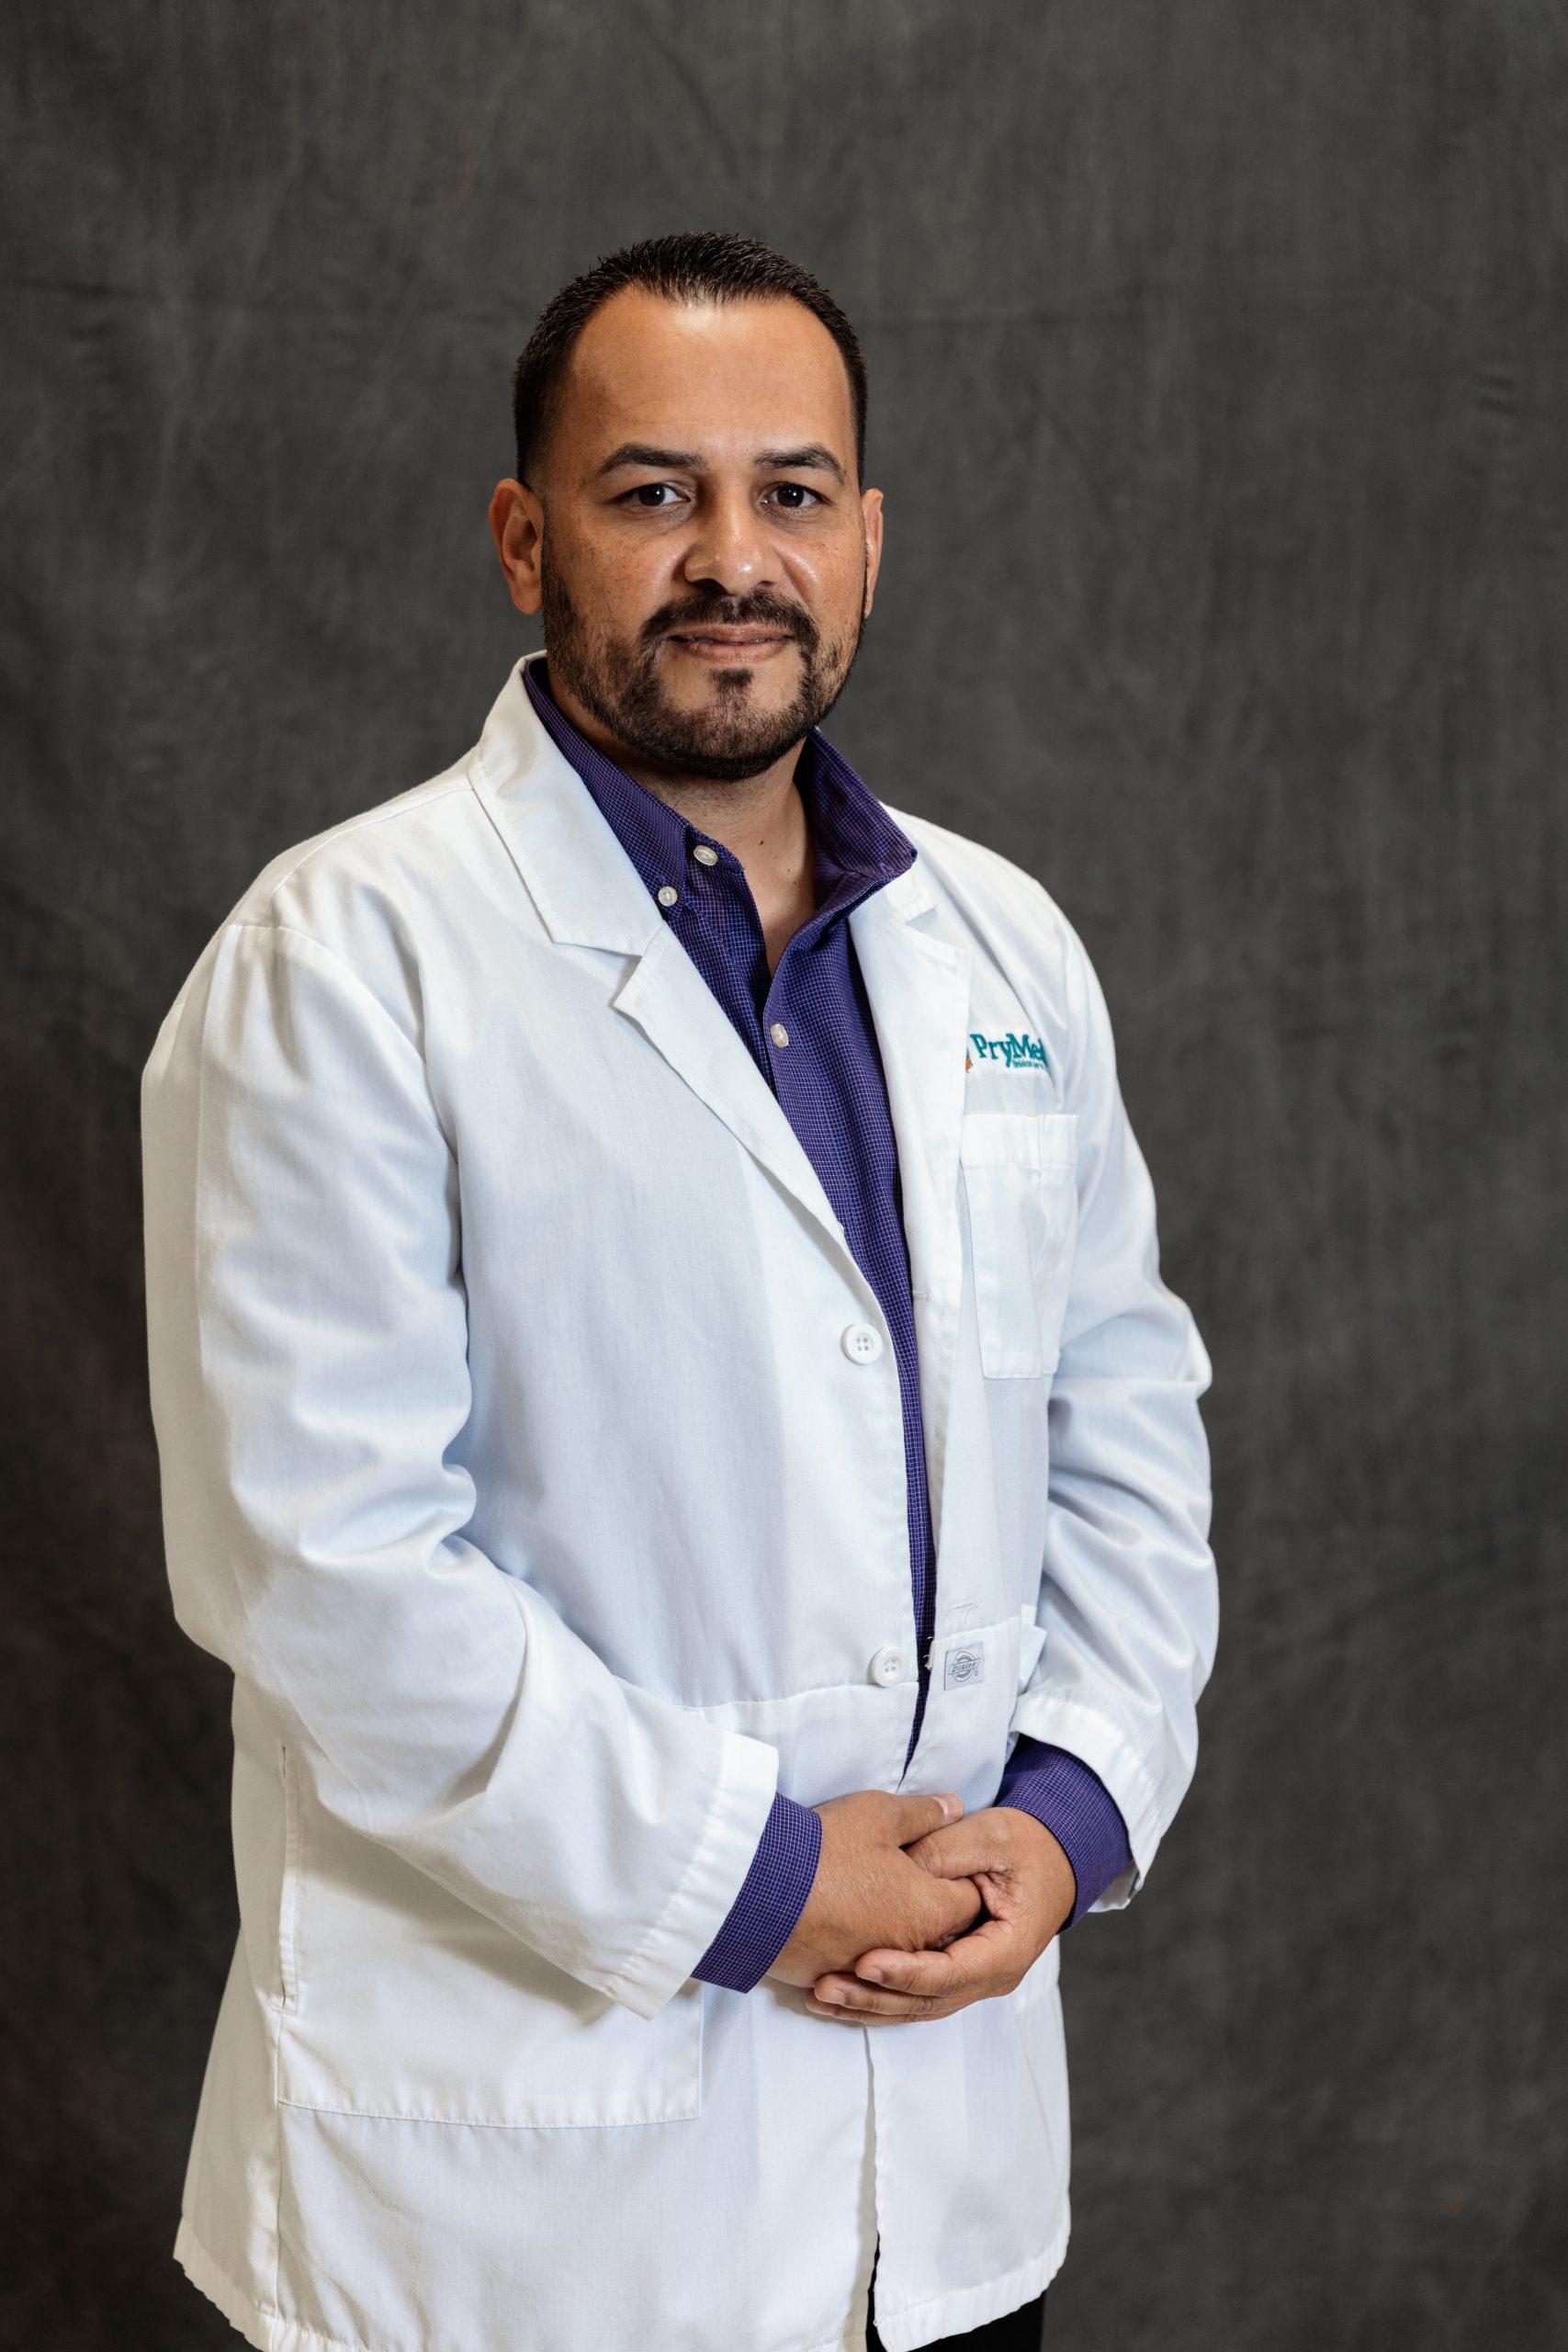 Dr. Angel Ayala